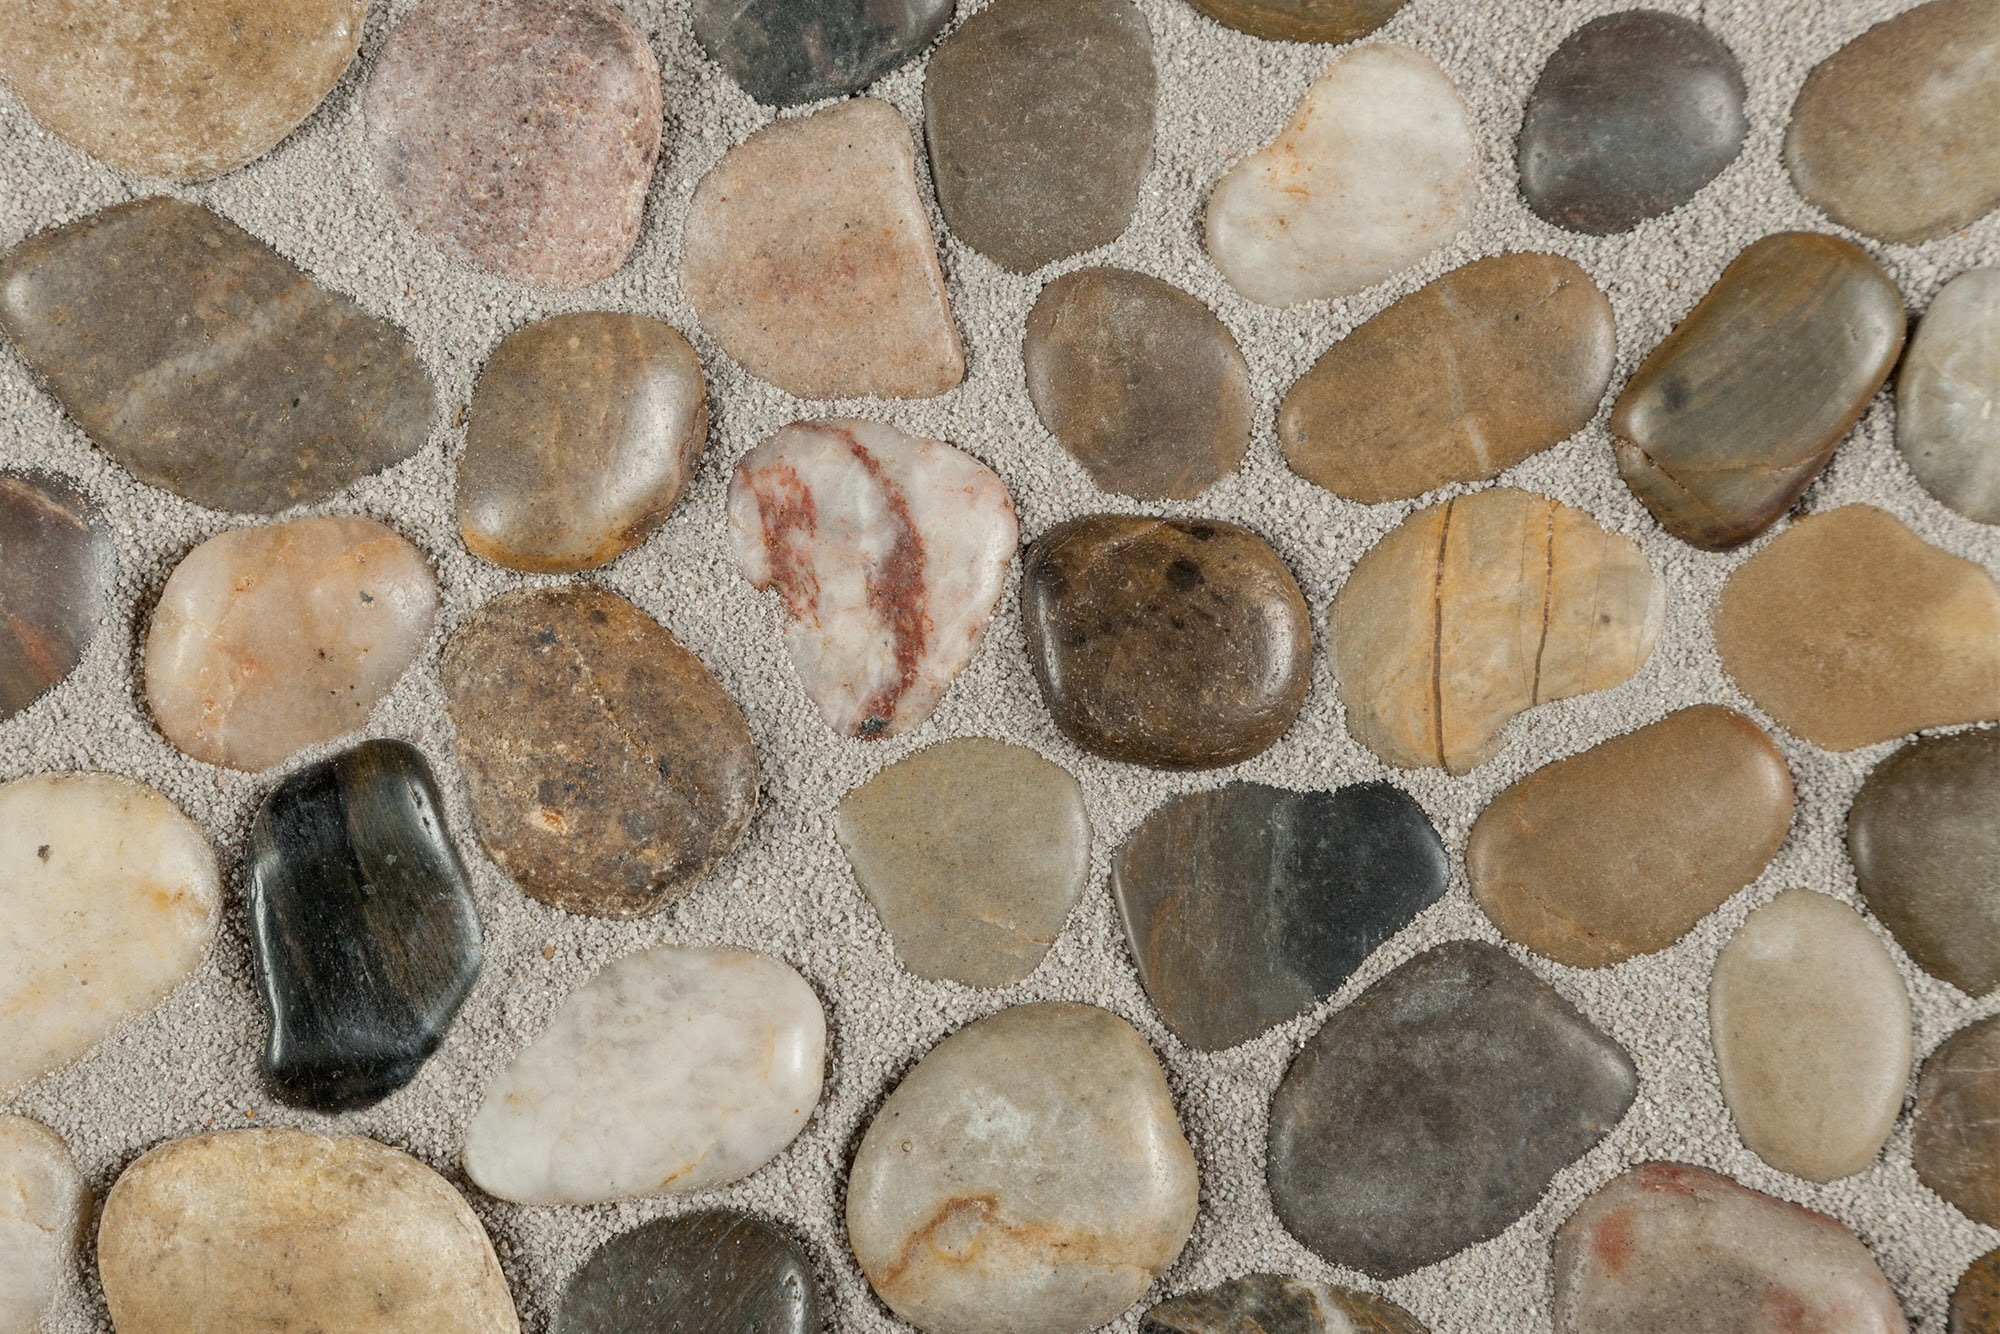 Optico Mosaic Tile - Tumbled Stone Series Garden Blend / Random